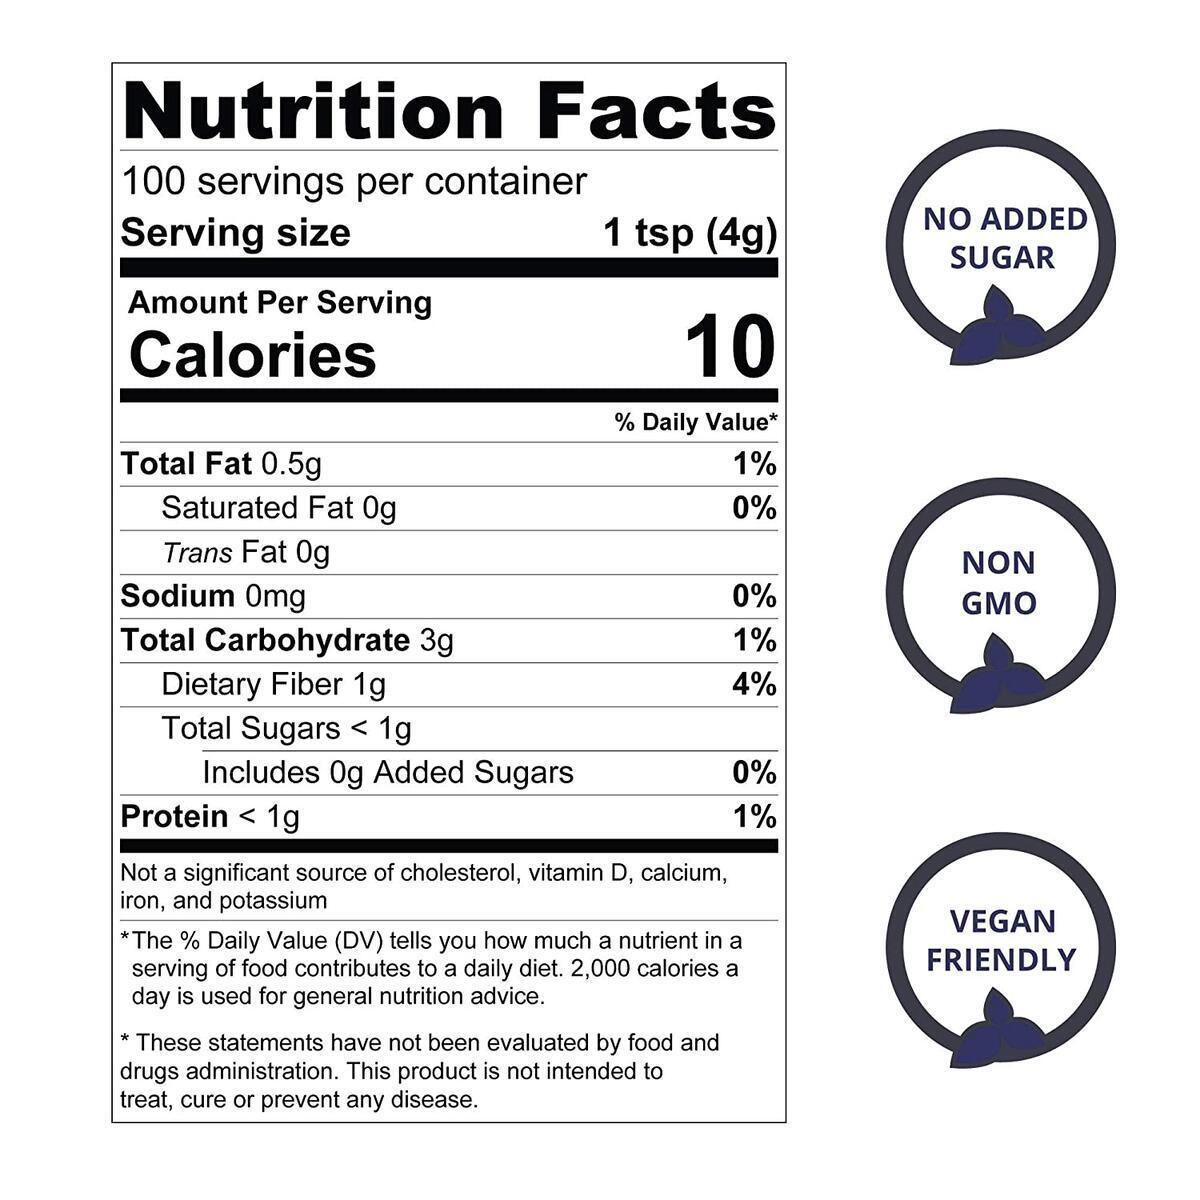 Jungle Powders Aronia Powder   14oz 100% Natural Non Gmo Vegan Friendly Black Chokeberry Powder   Freeze Dried Antioxidant Superfood Concentrate…